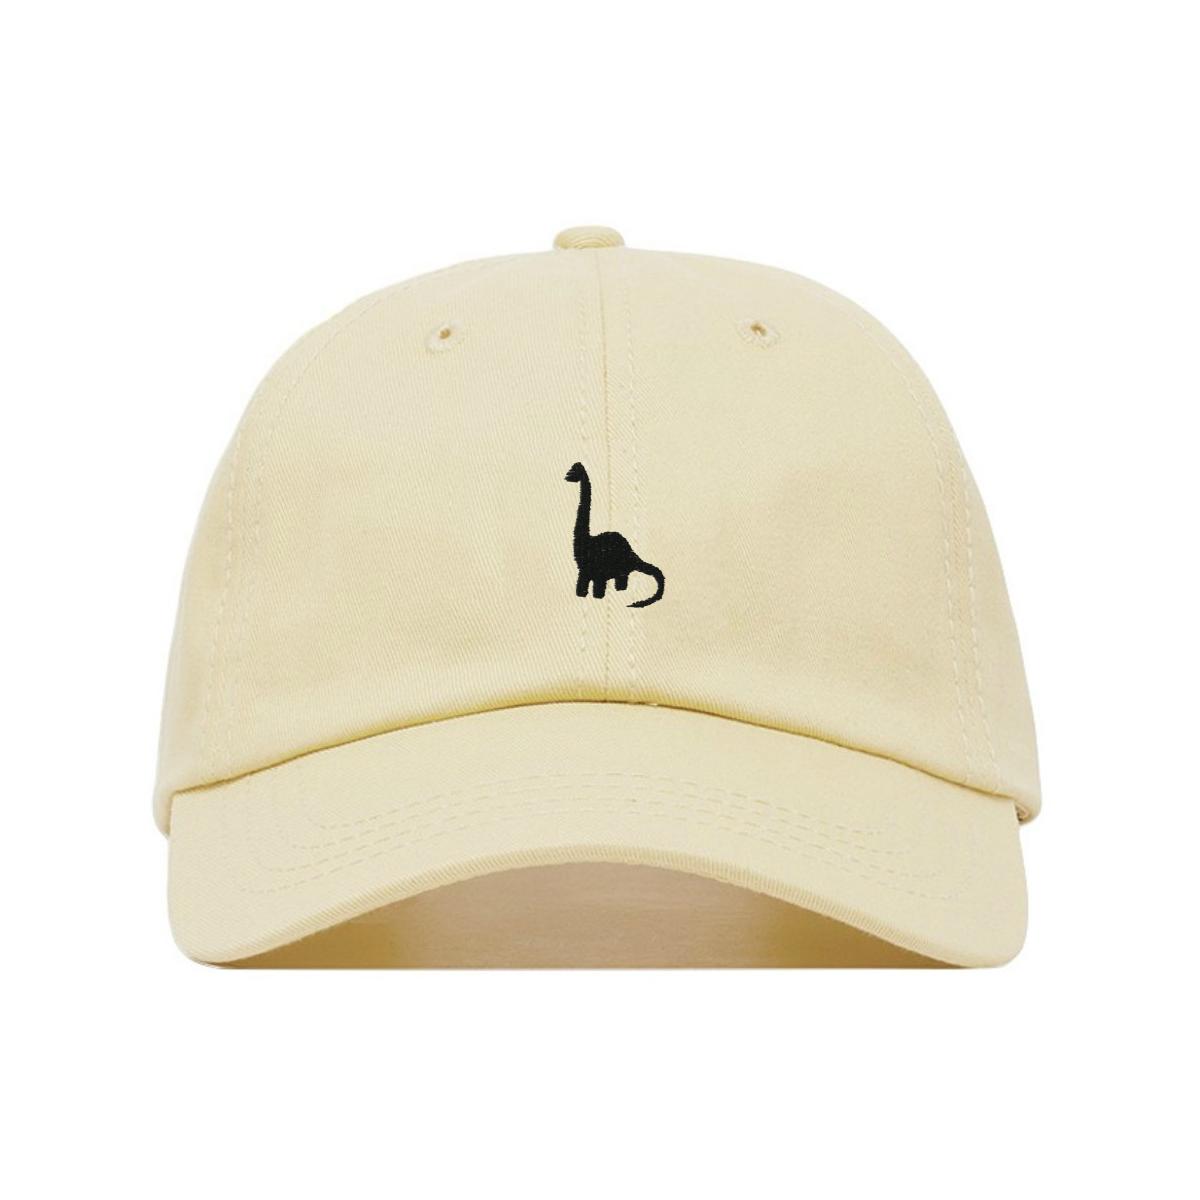 Personalized YouCustomizeIt Dinosaur Print Baby Hat Beanie